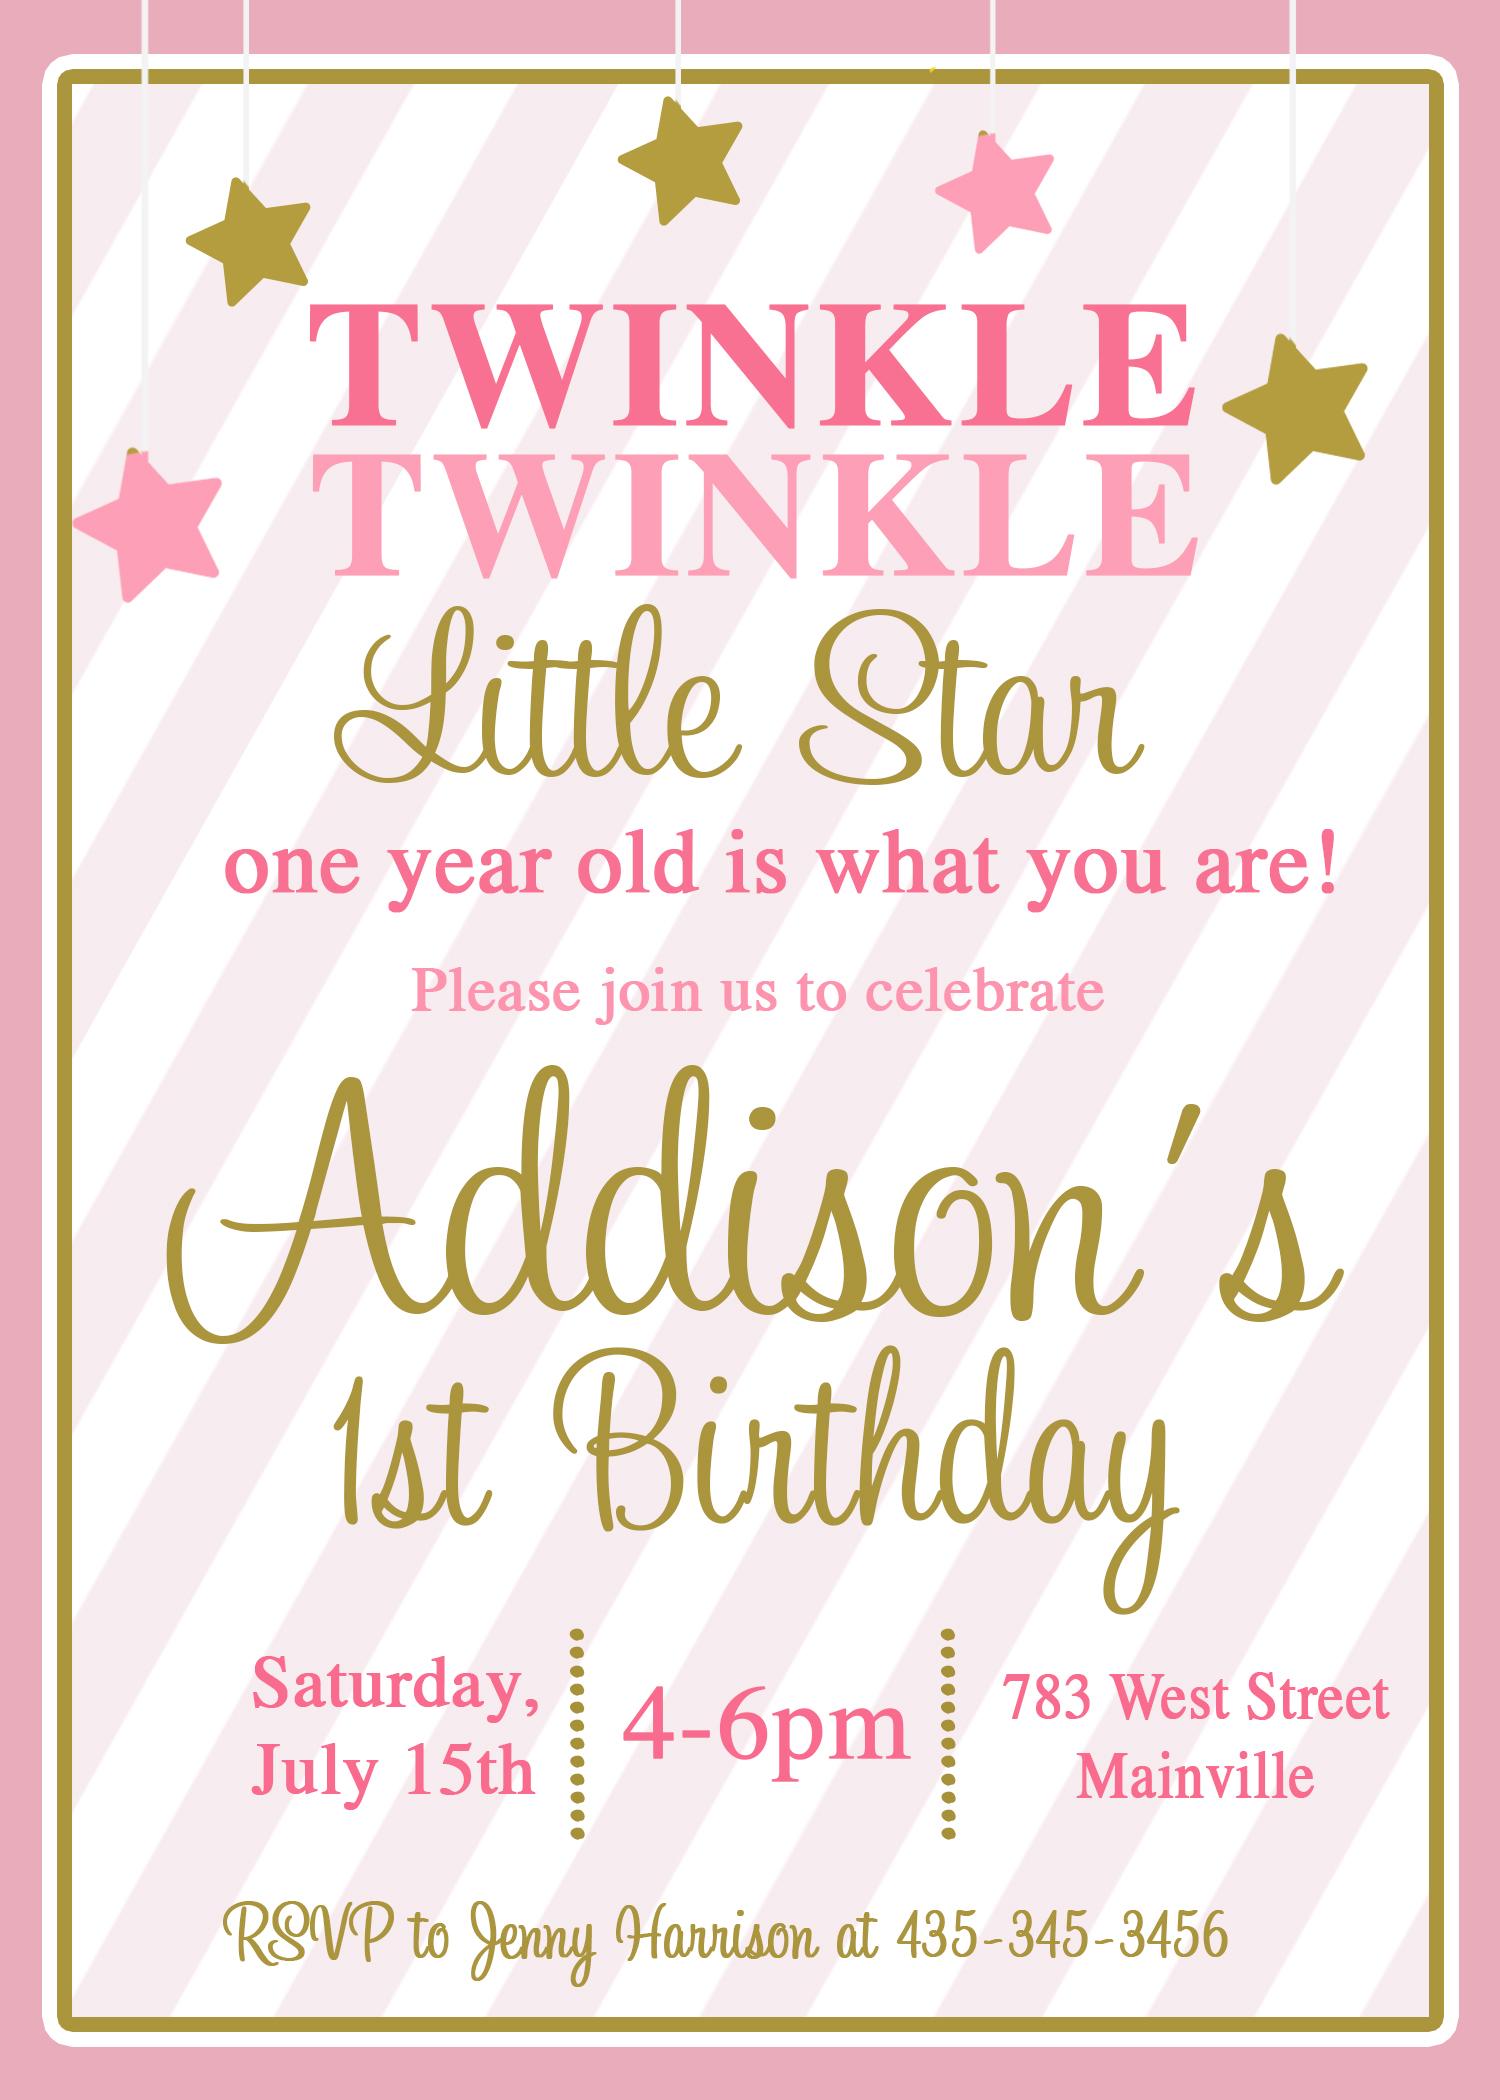 twinkle little star invitation pink